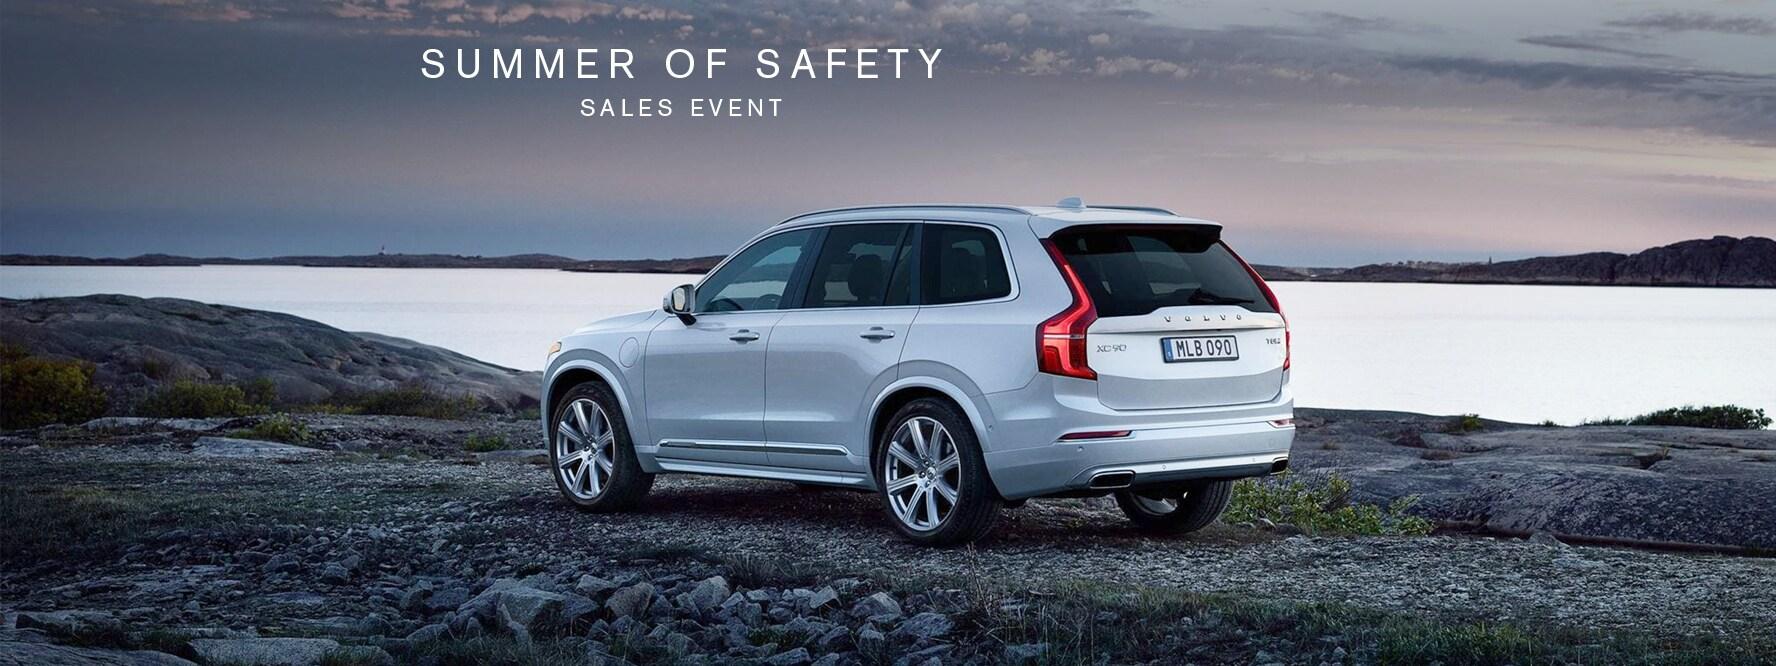 New 2019 Volvo Cars Suvs For Sale Lease In Plano Tx Crest Volvo